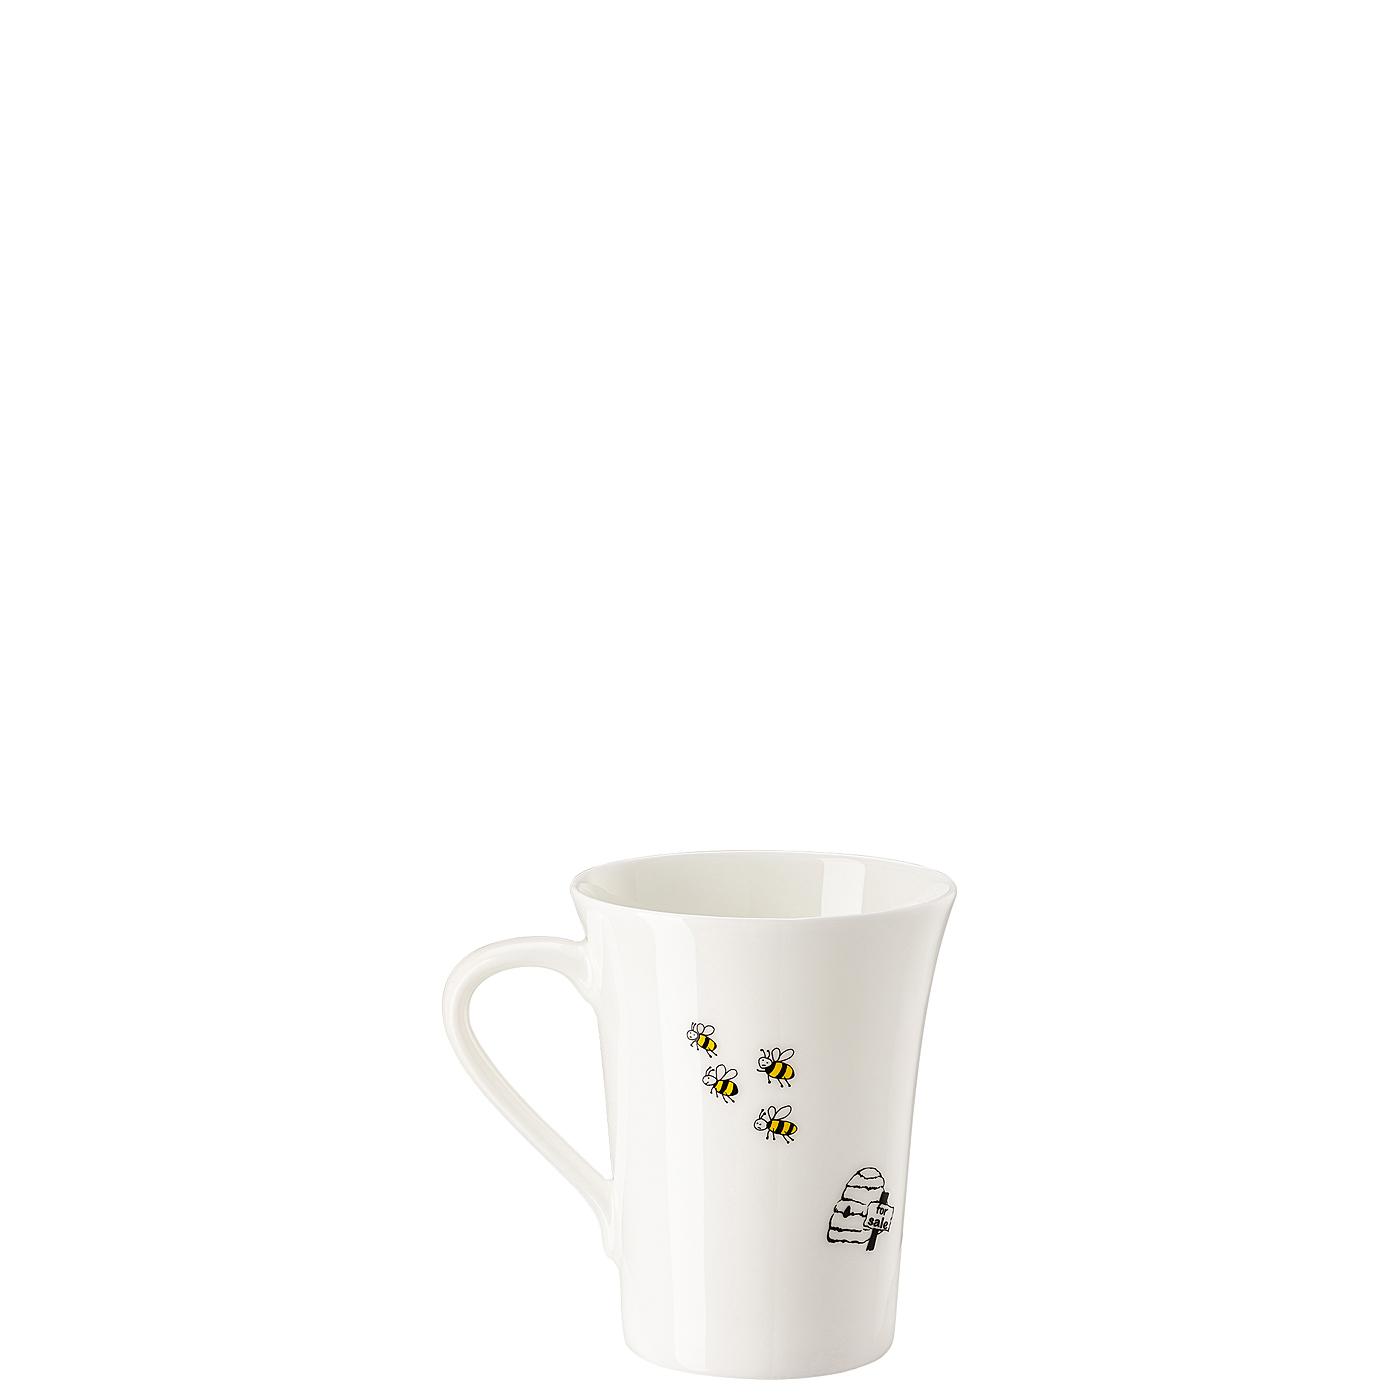 Becher mit Henkel My Mug Collection Bees - On the road Hutschenreuther